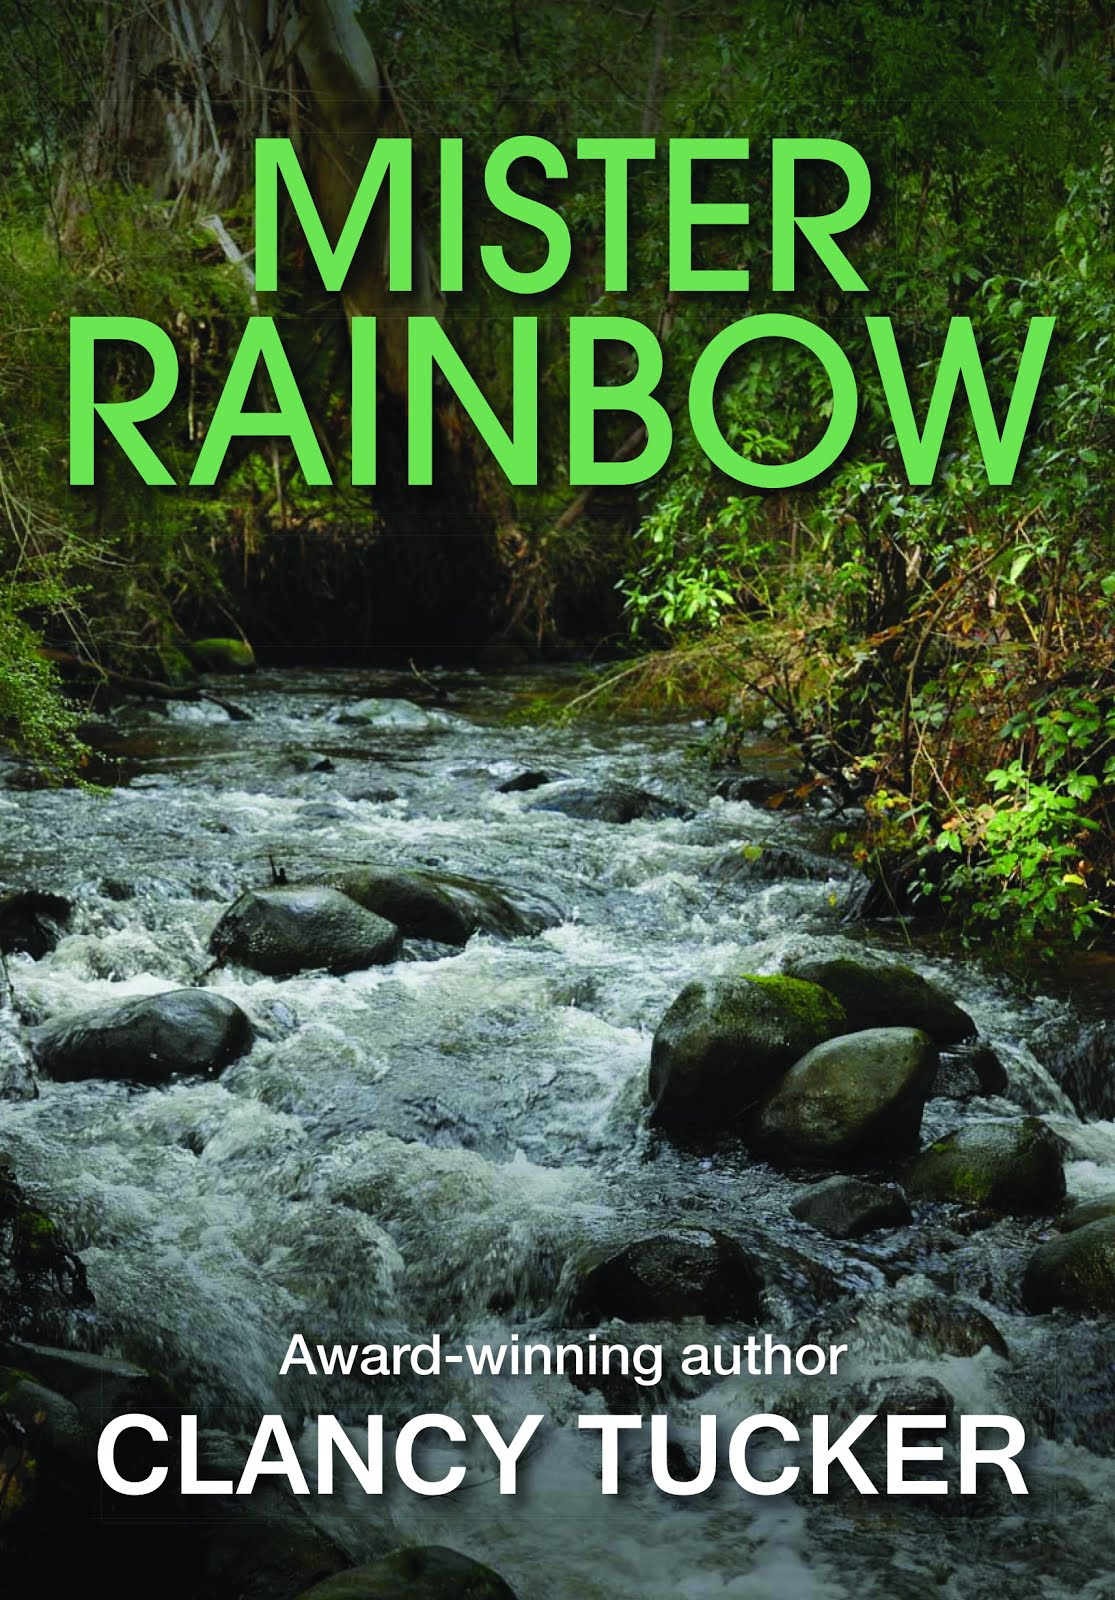 'MISTER RAINBOW' - AUSTRALIA